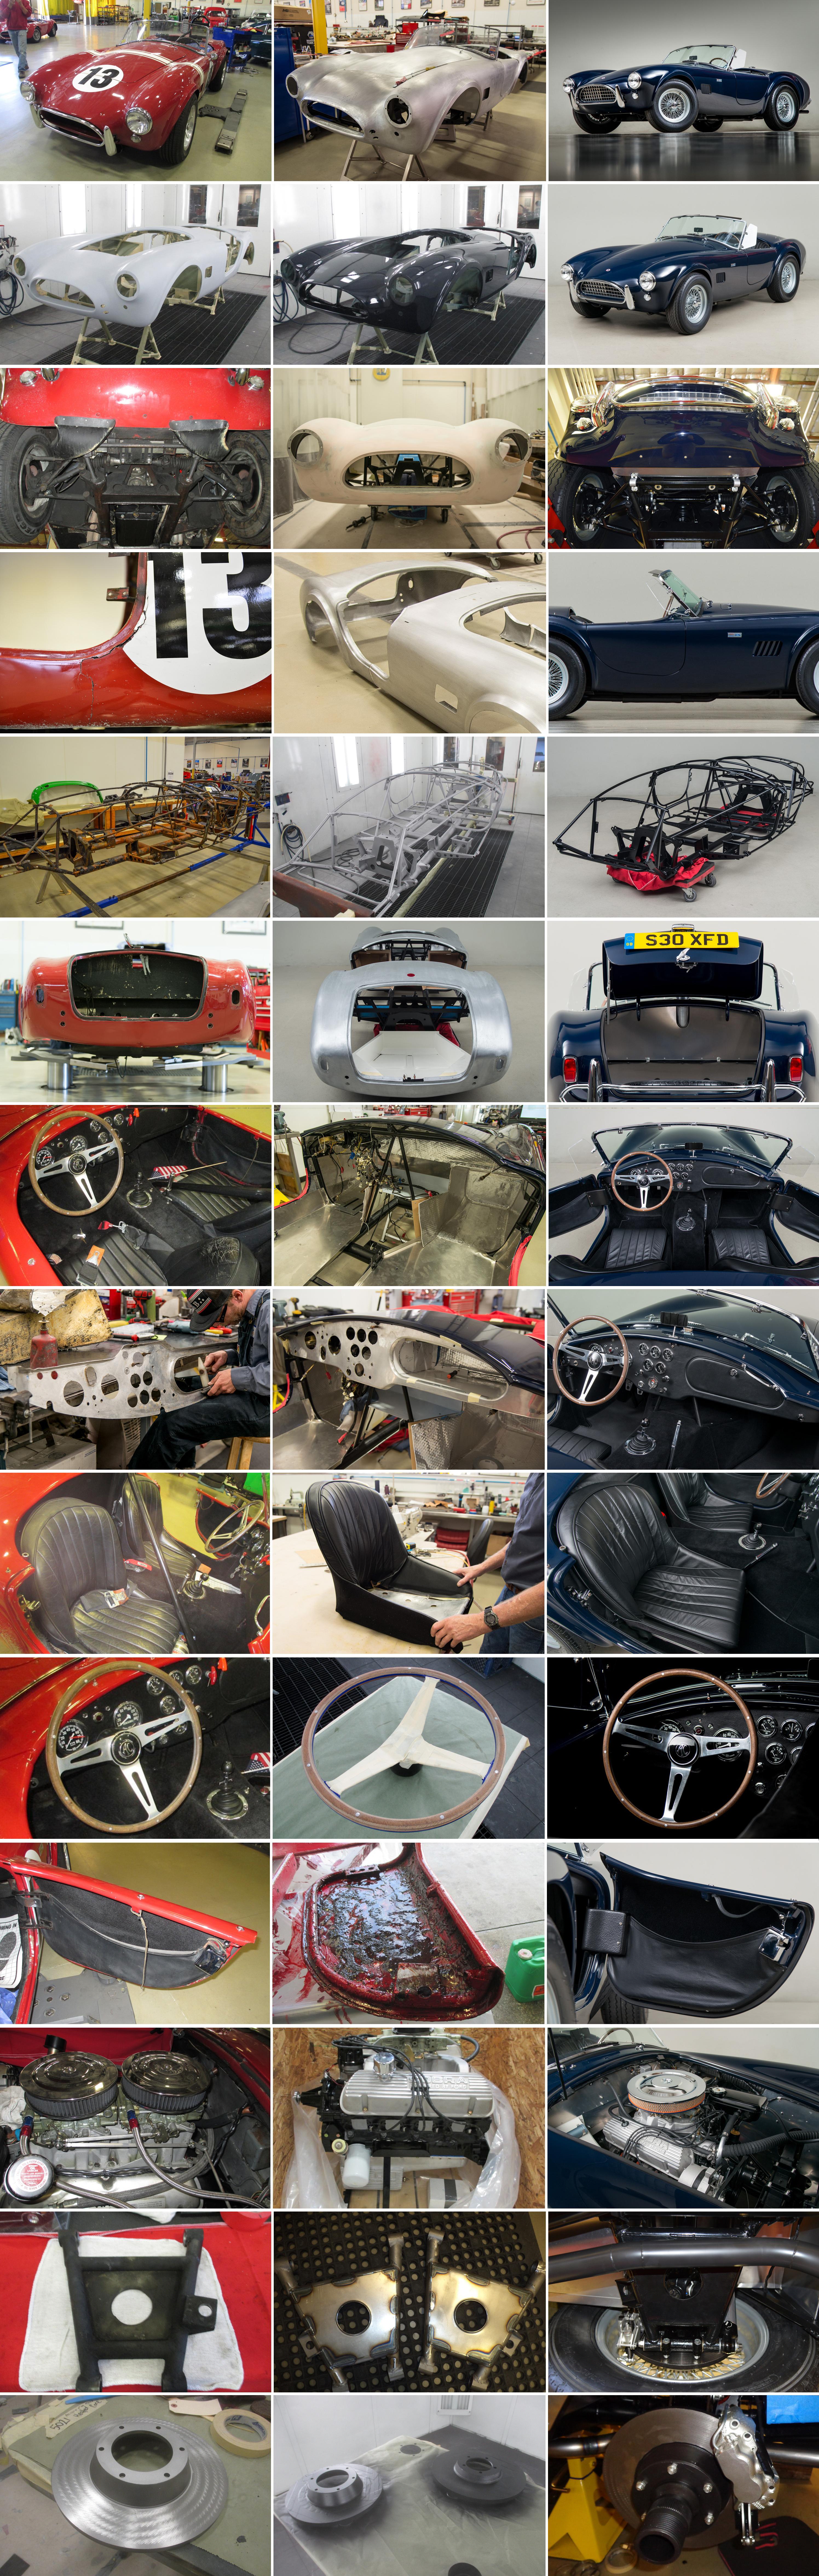 Shelby Cobra Restoration Gallery